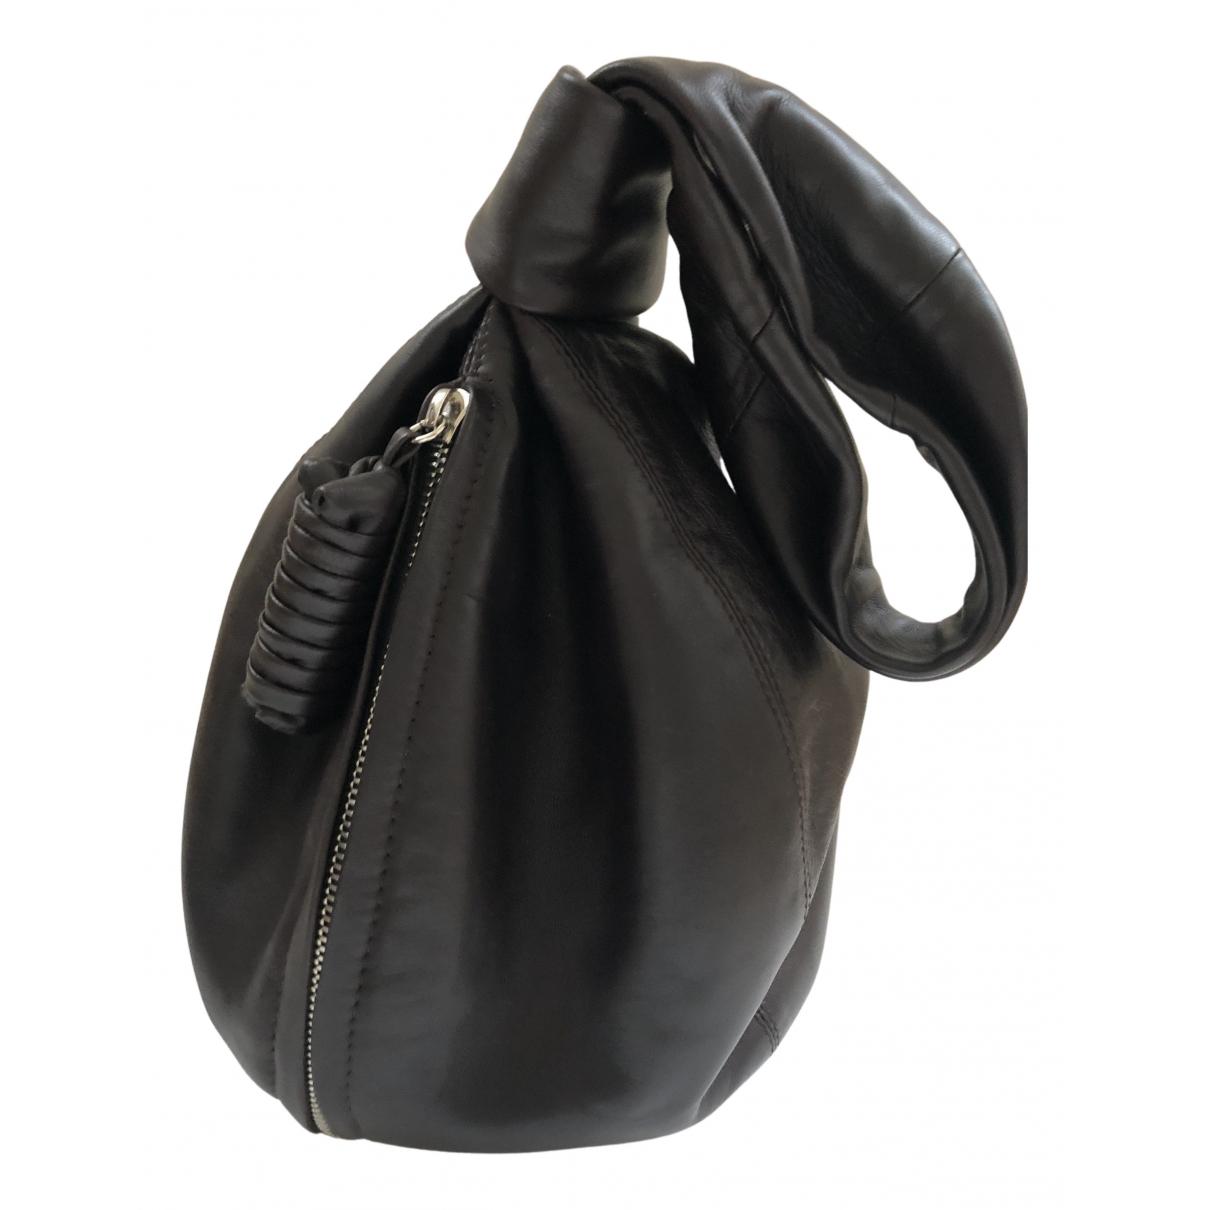 Lemaire N Brown Leather handbag for Women N